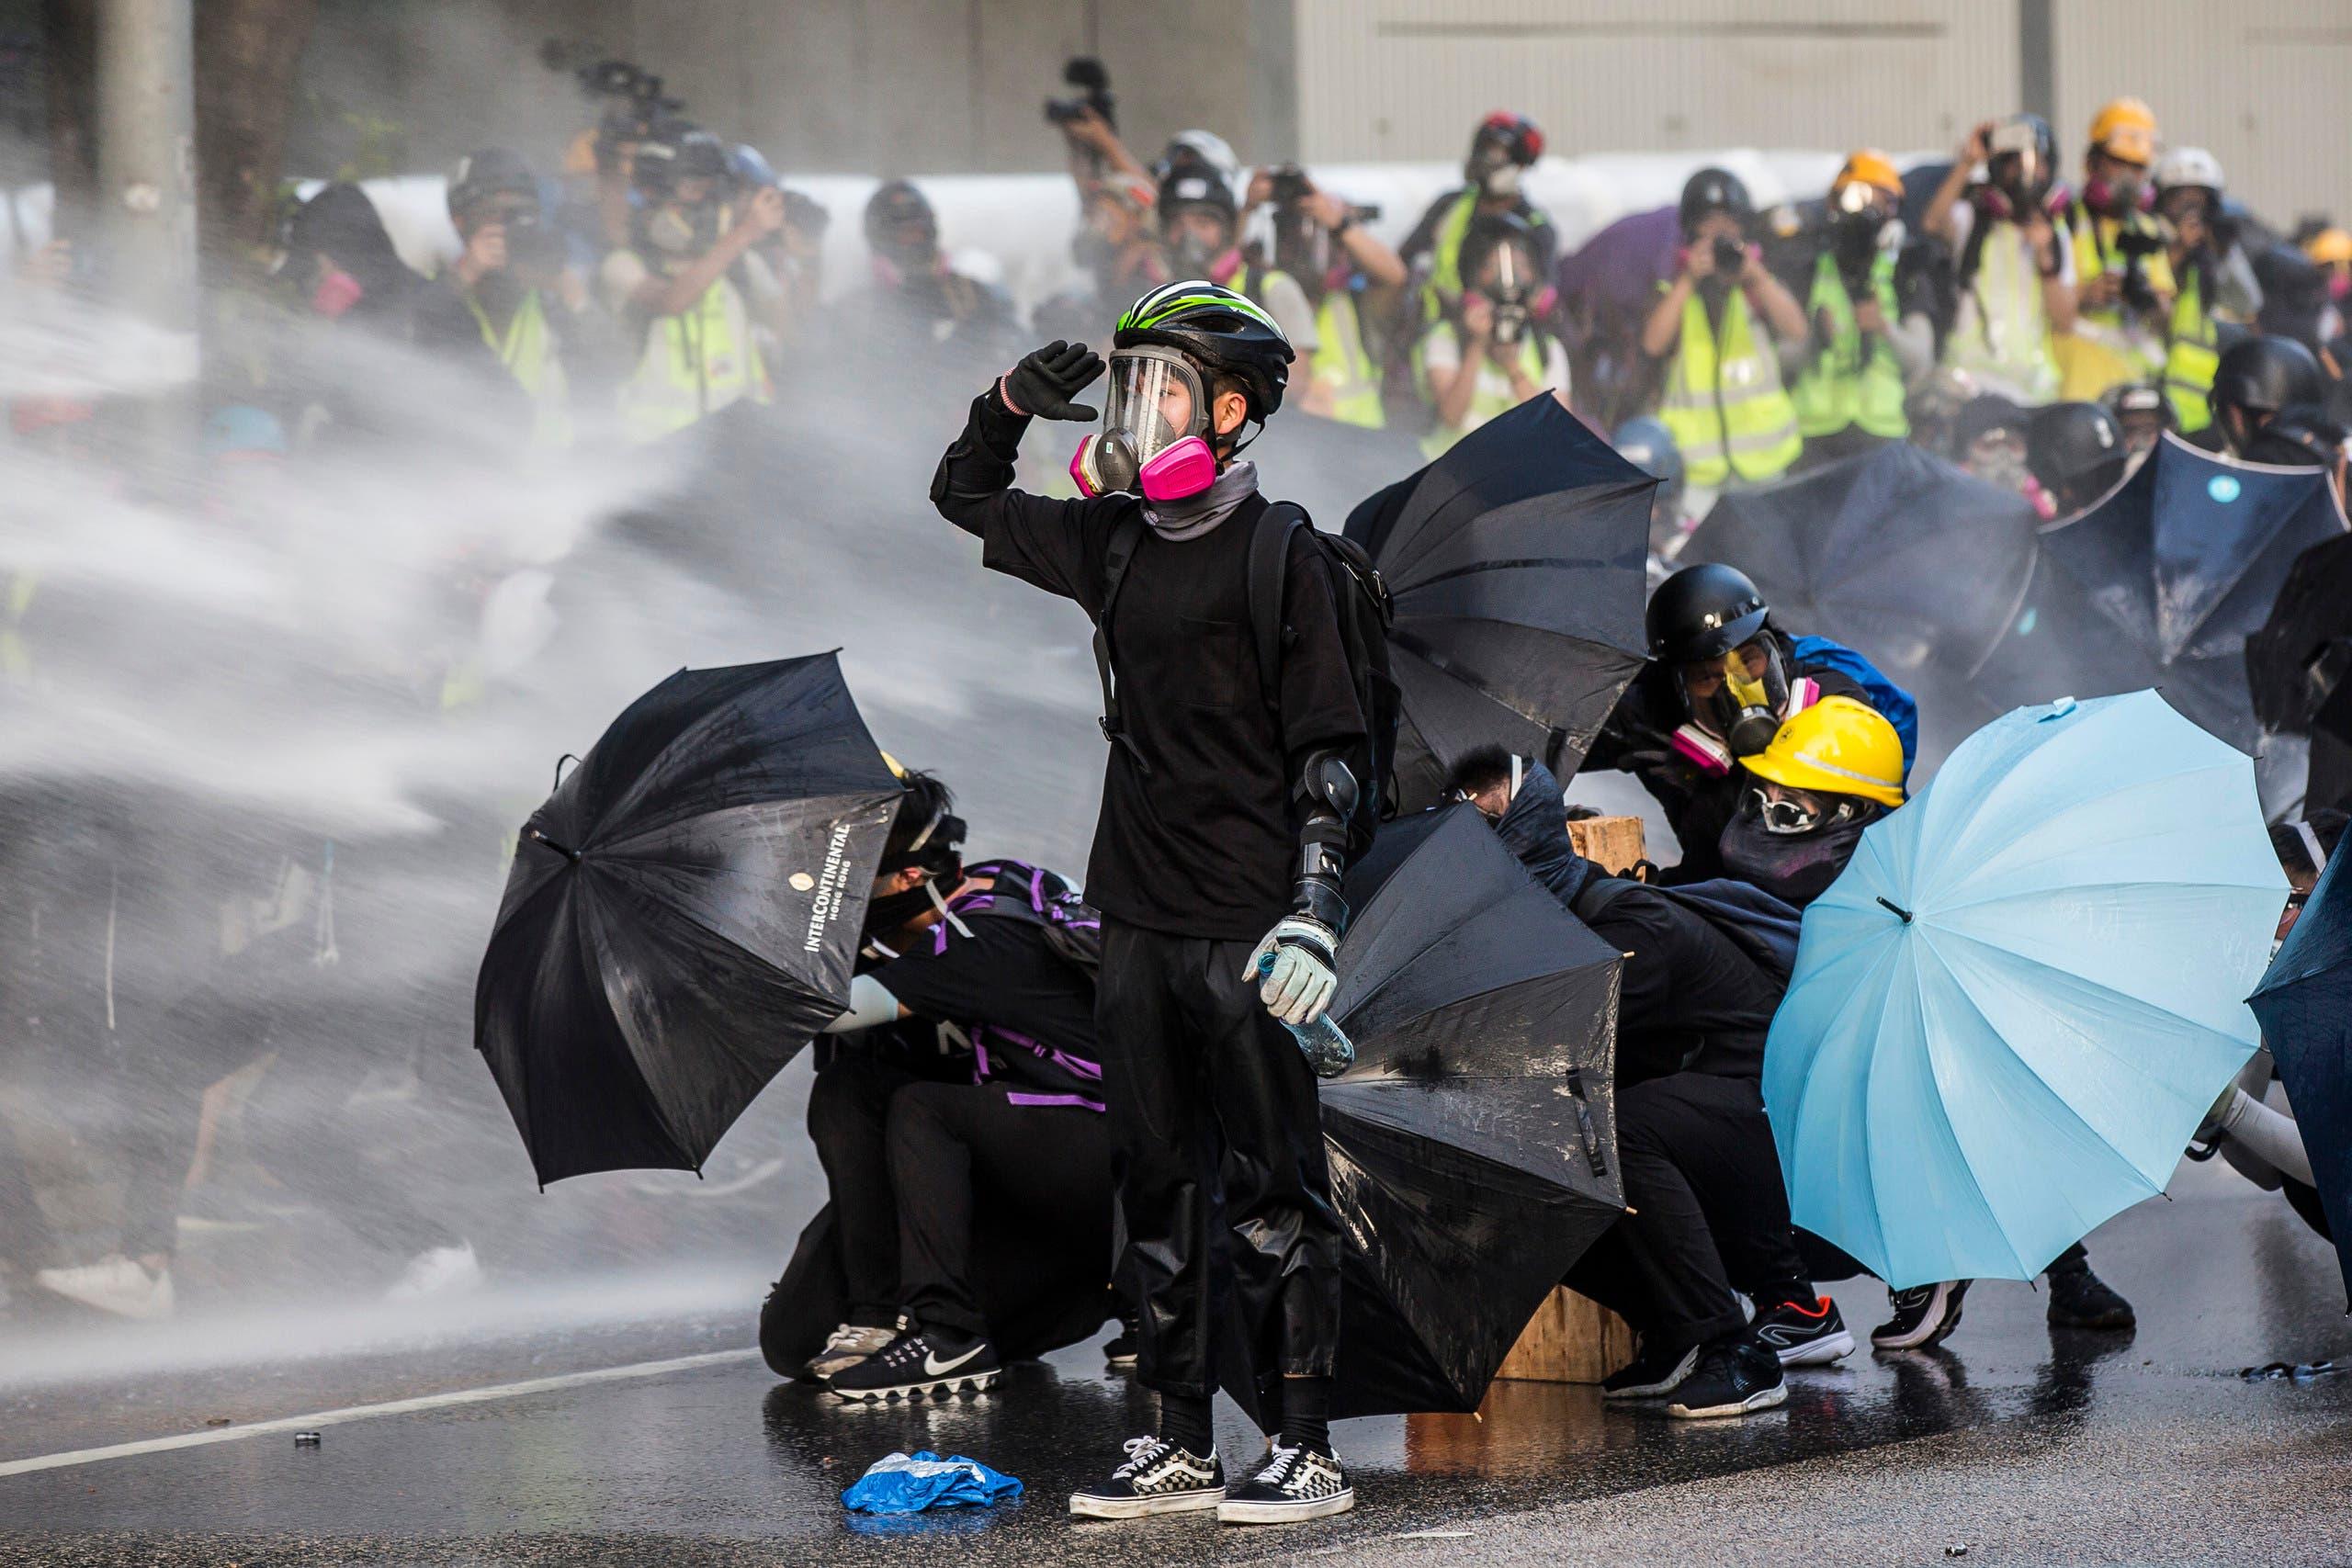 مظاهرات هونغ كونغ (فرانس برس)